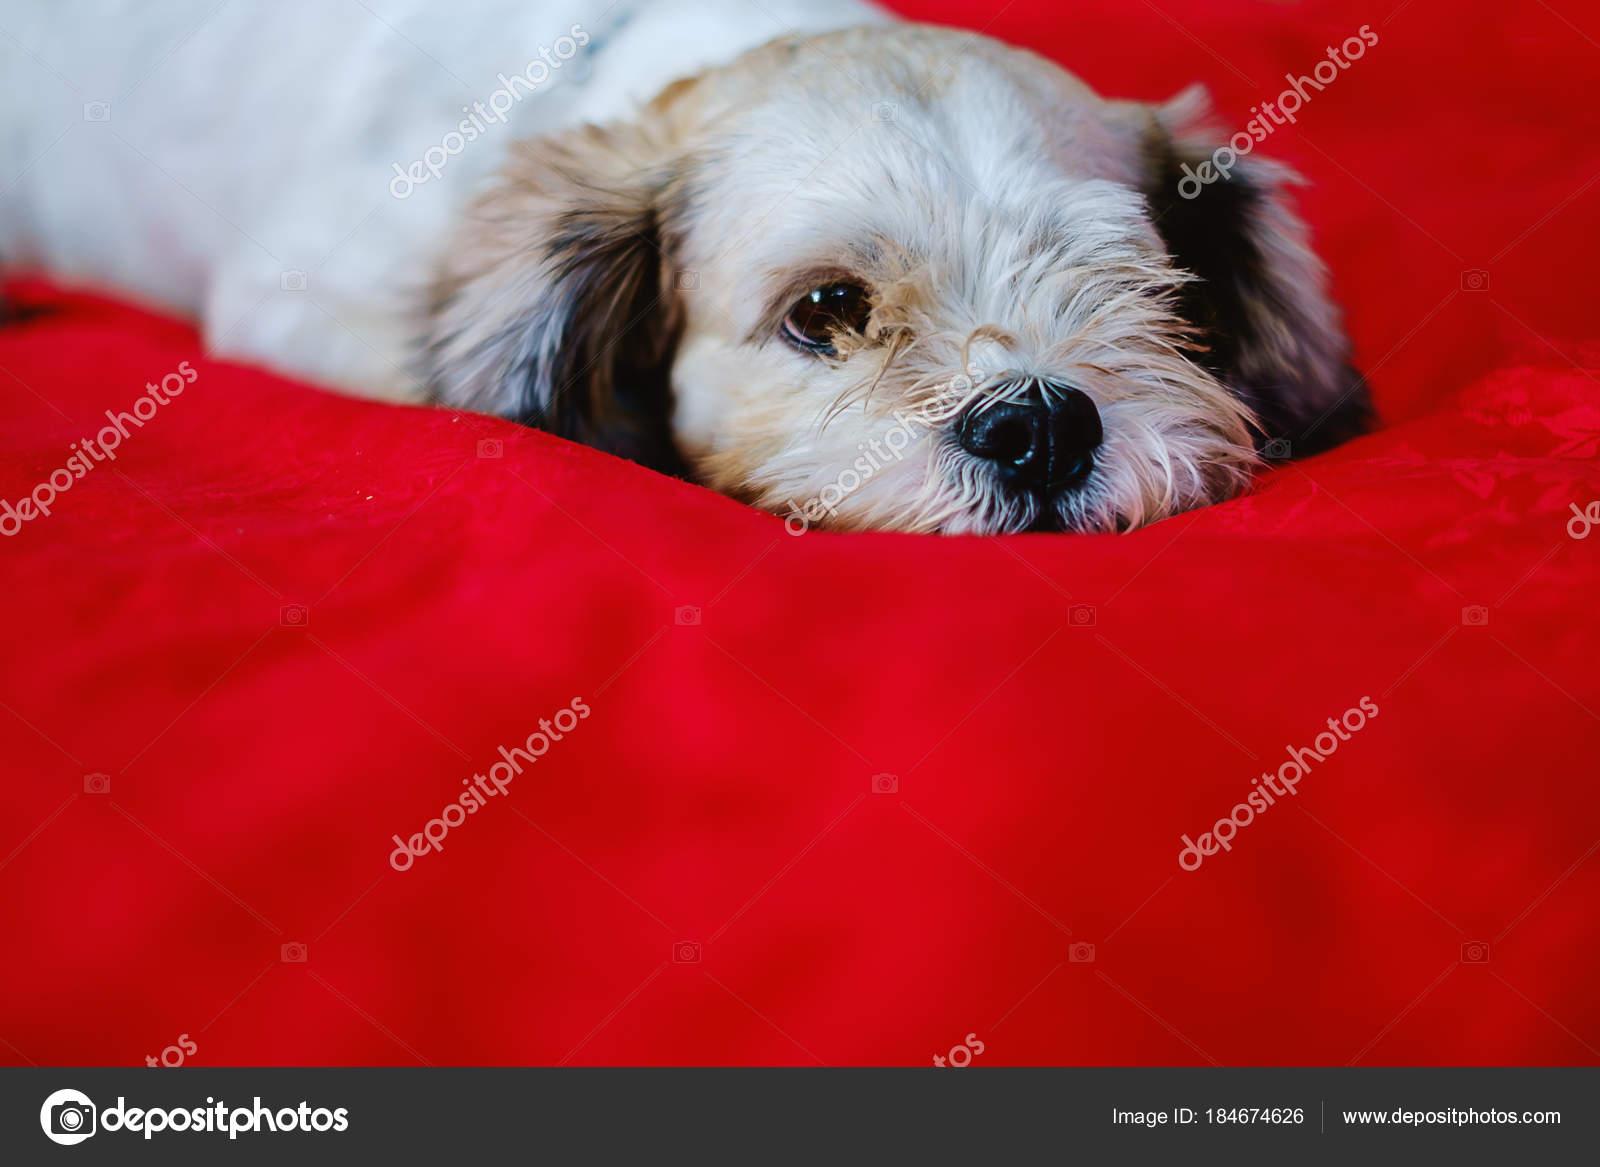 Cutely White Short Hair Shih Tzu Dog On Red Fabric Background